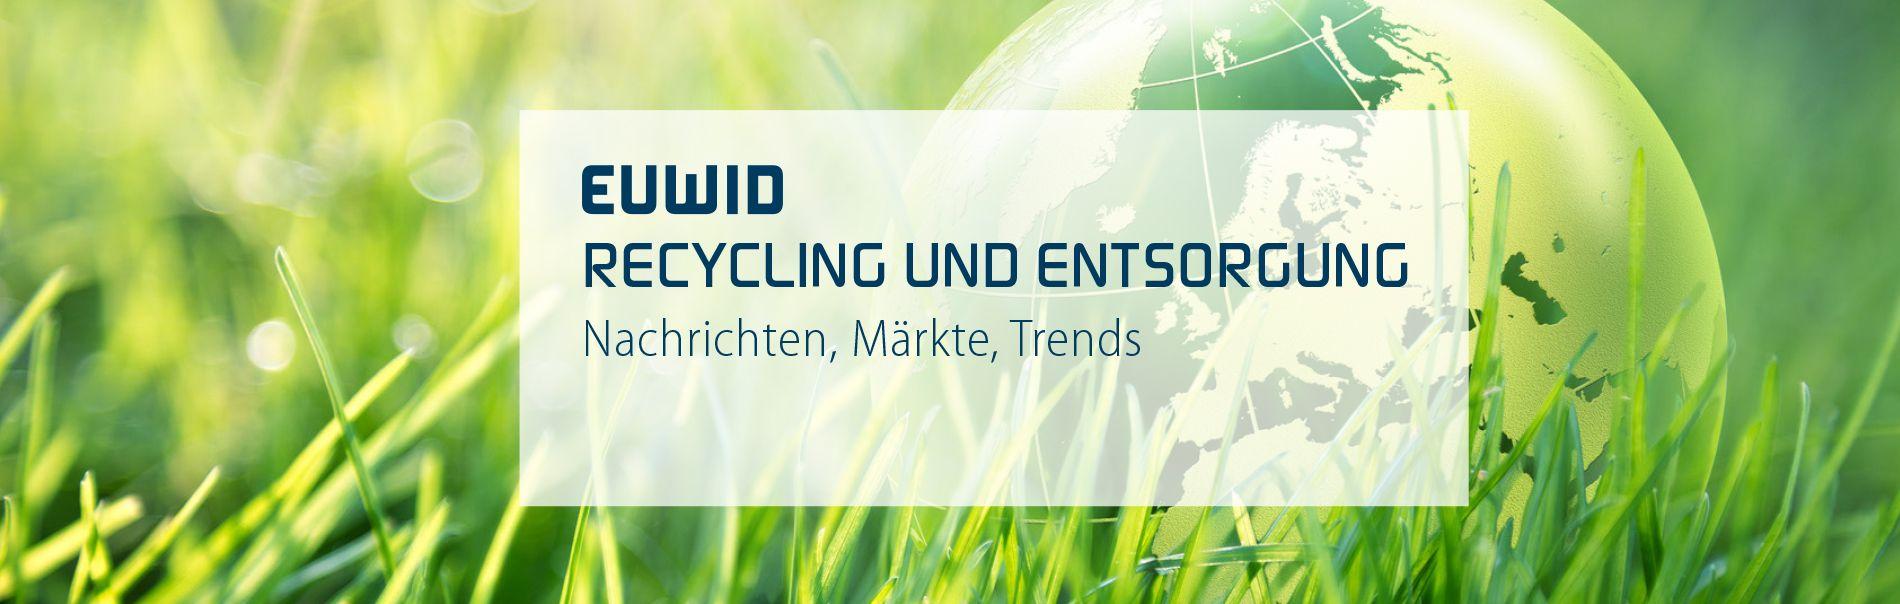 EUWID Recycling und Entsorgung